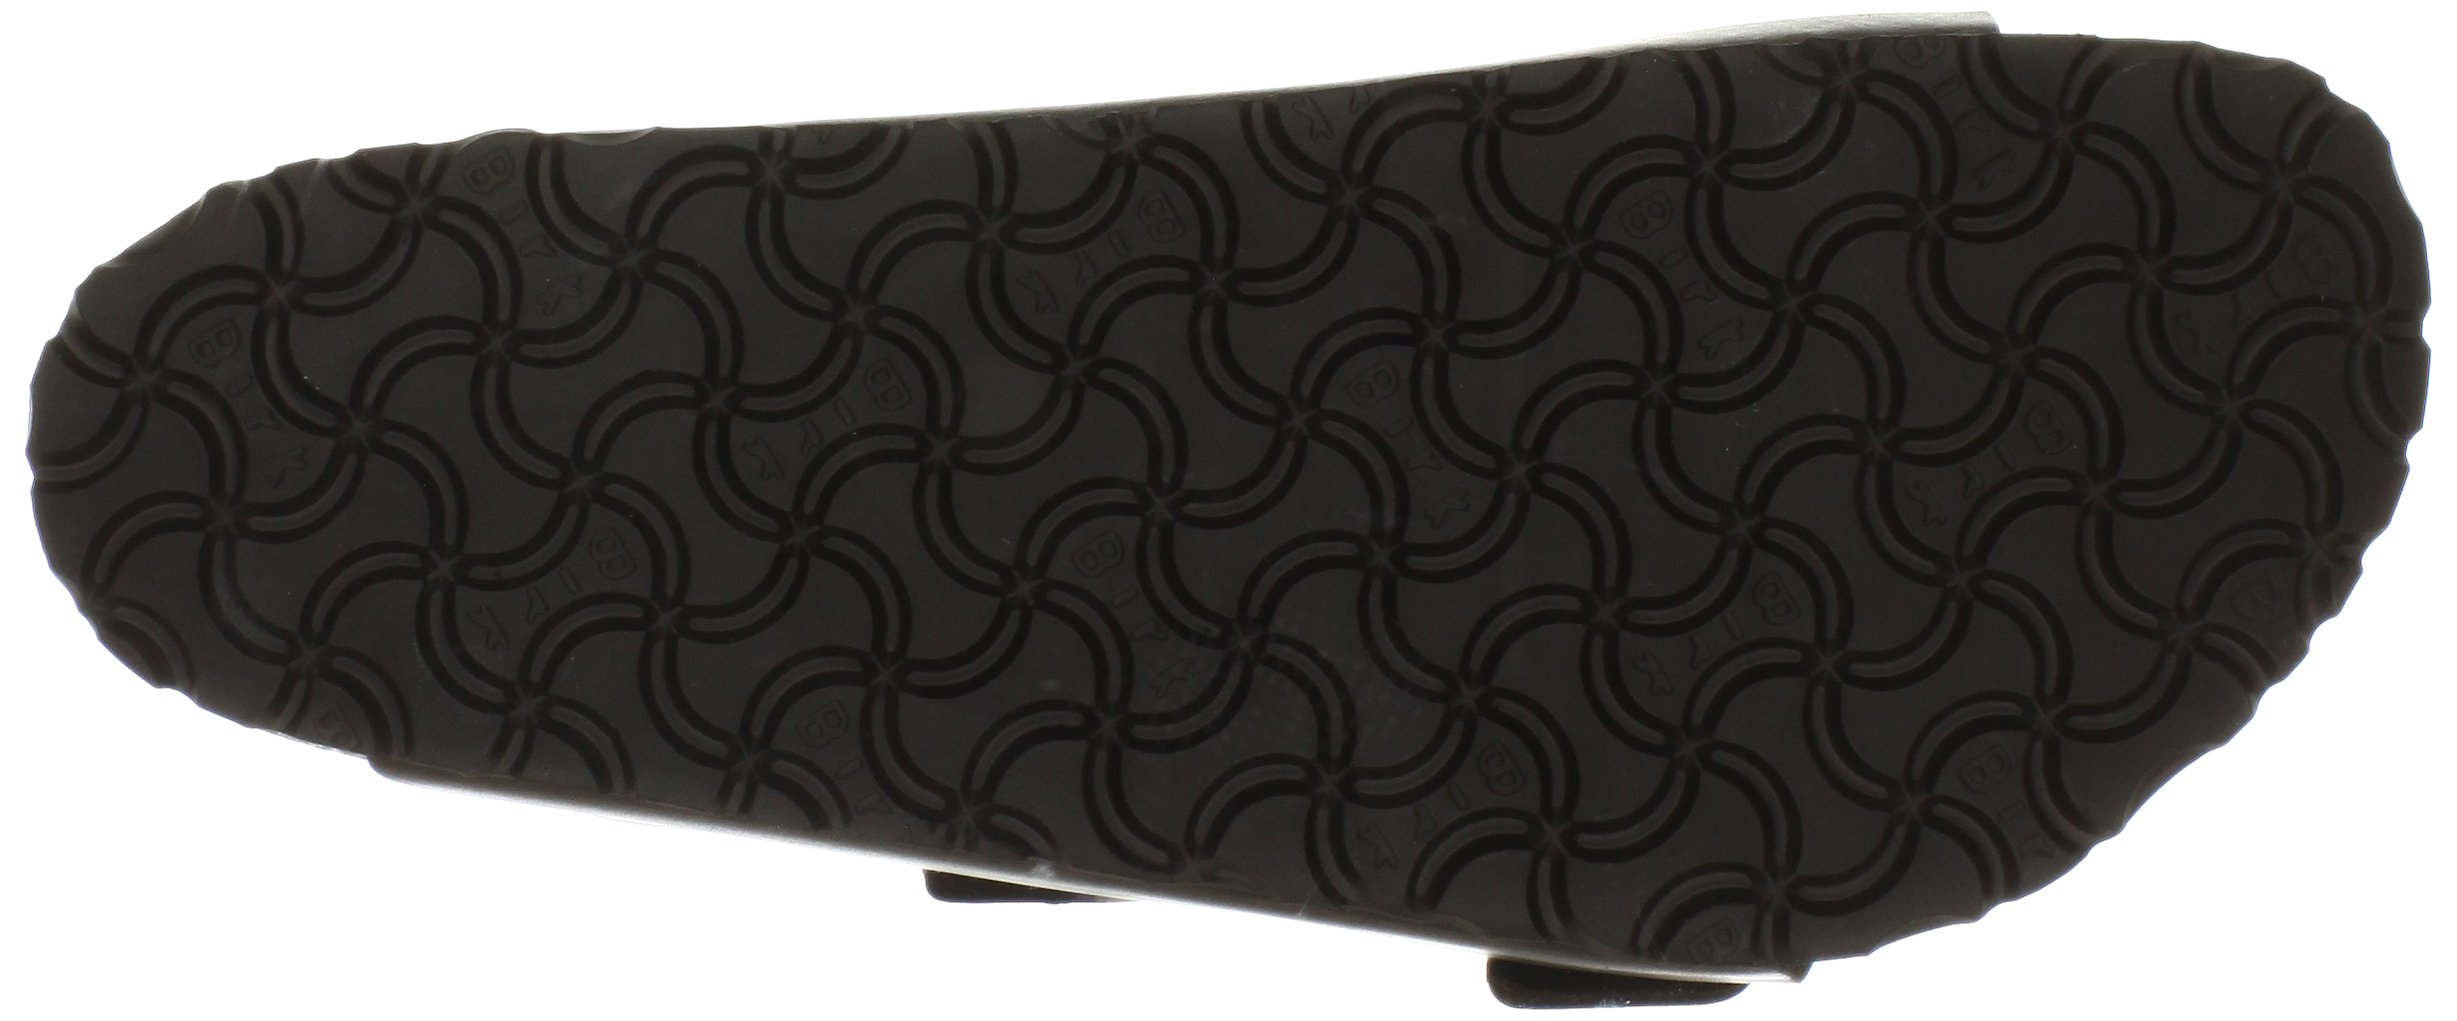 Birkenstock Unisex Arizona Brown Amalfi Leather Sandals - 39 M EU / 8-8.5 B(M) US by Birkenstock (Image #3)